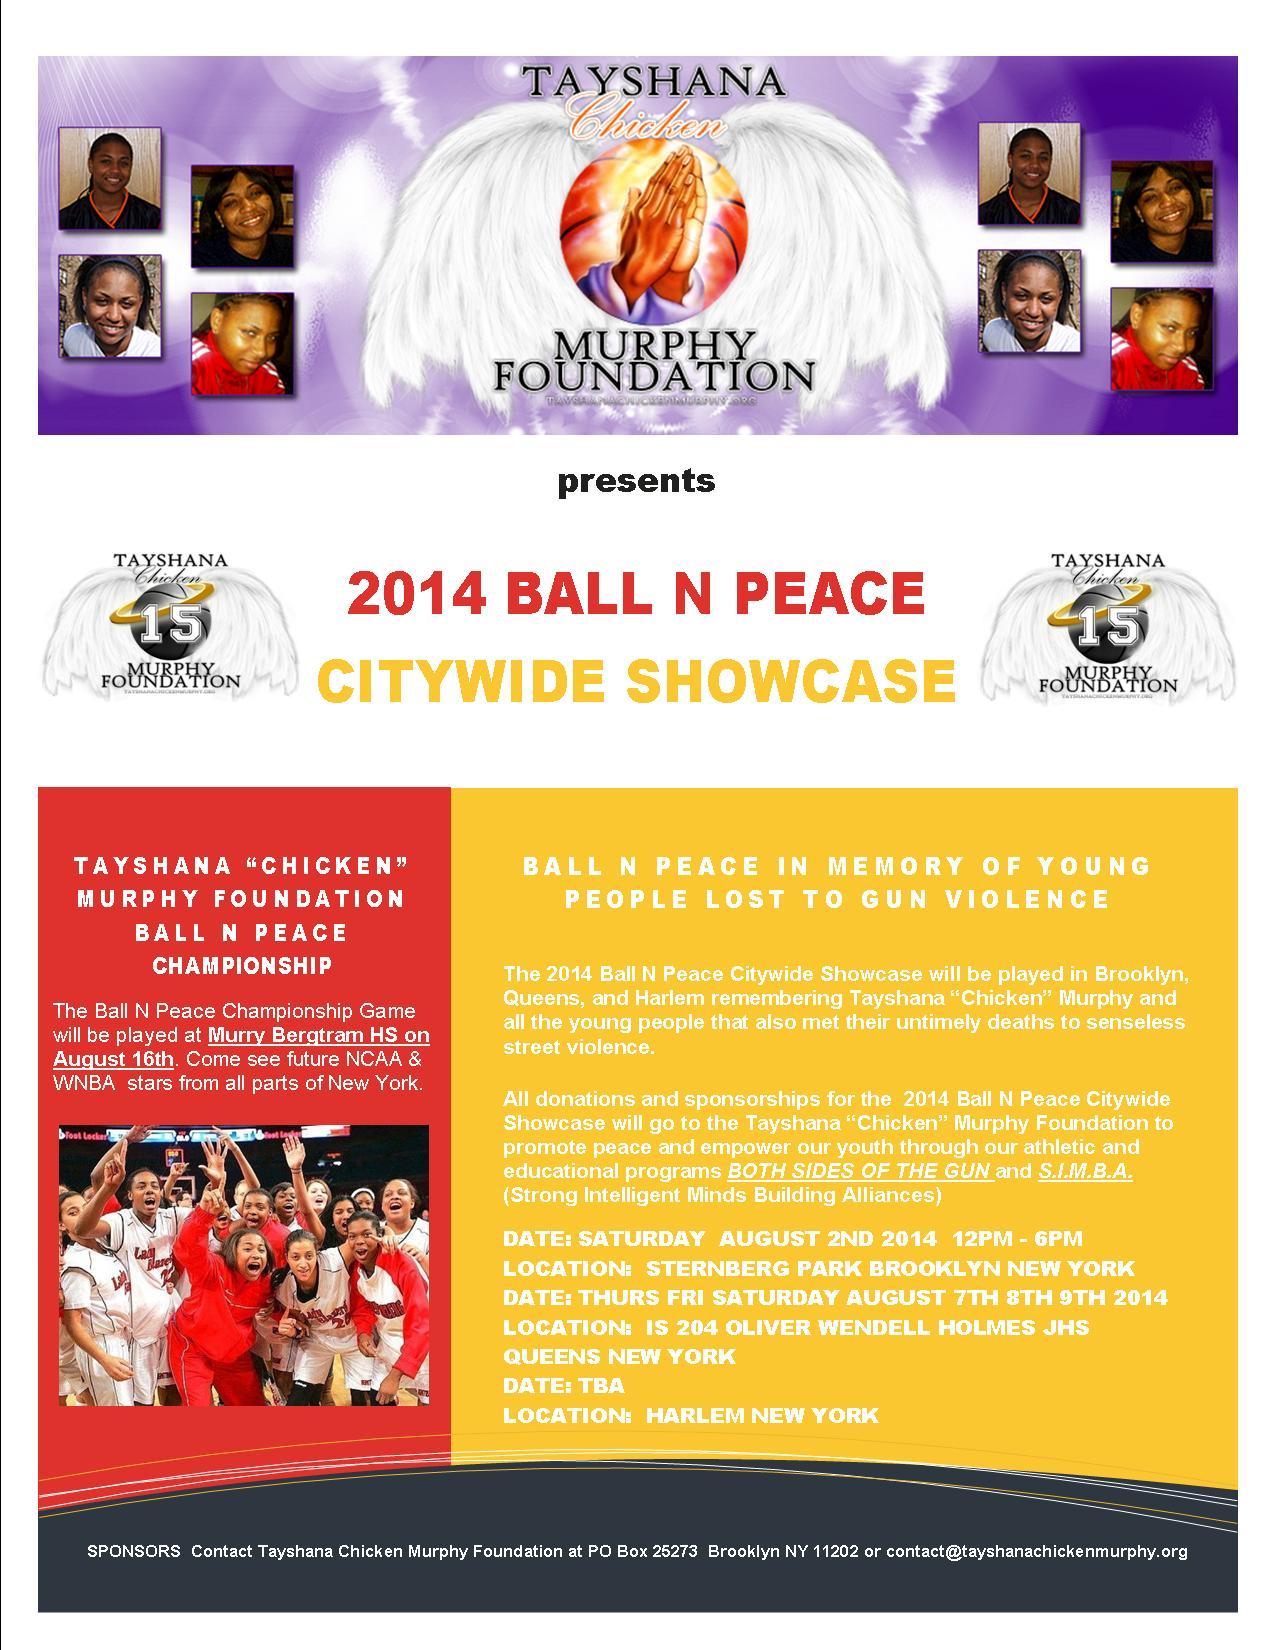 2014 Ball N Peace Citywide Showcase